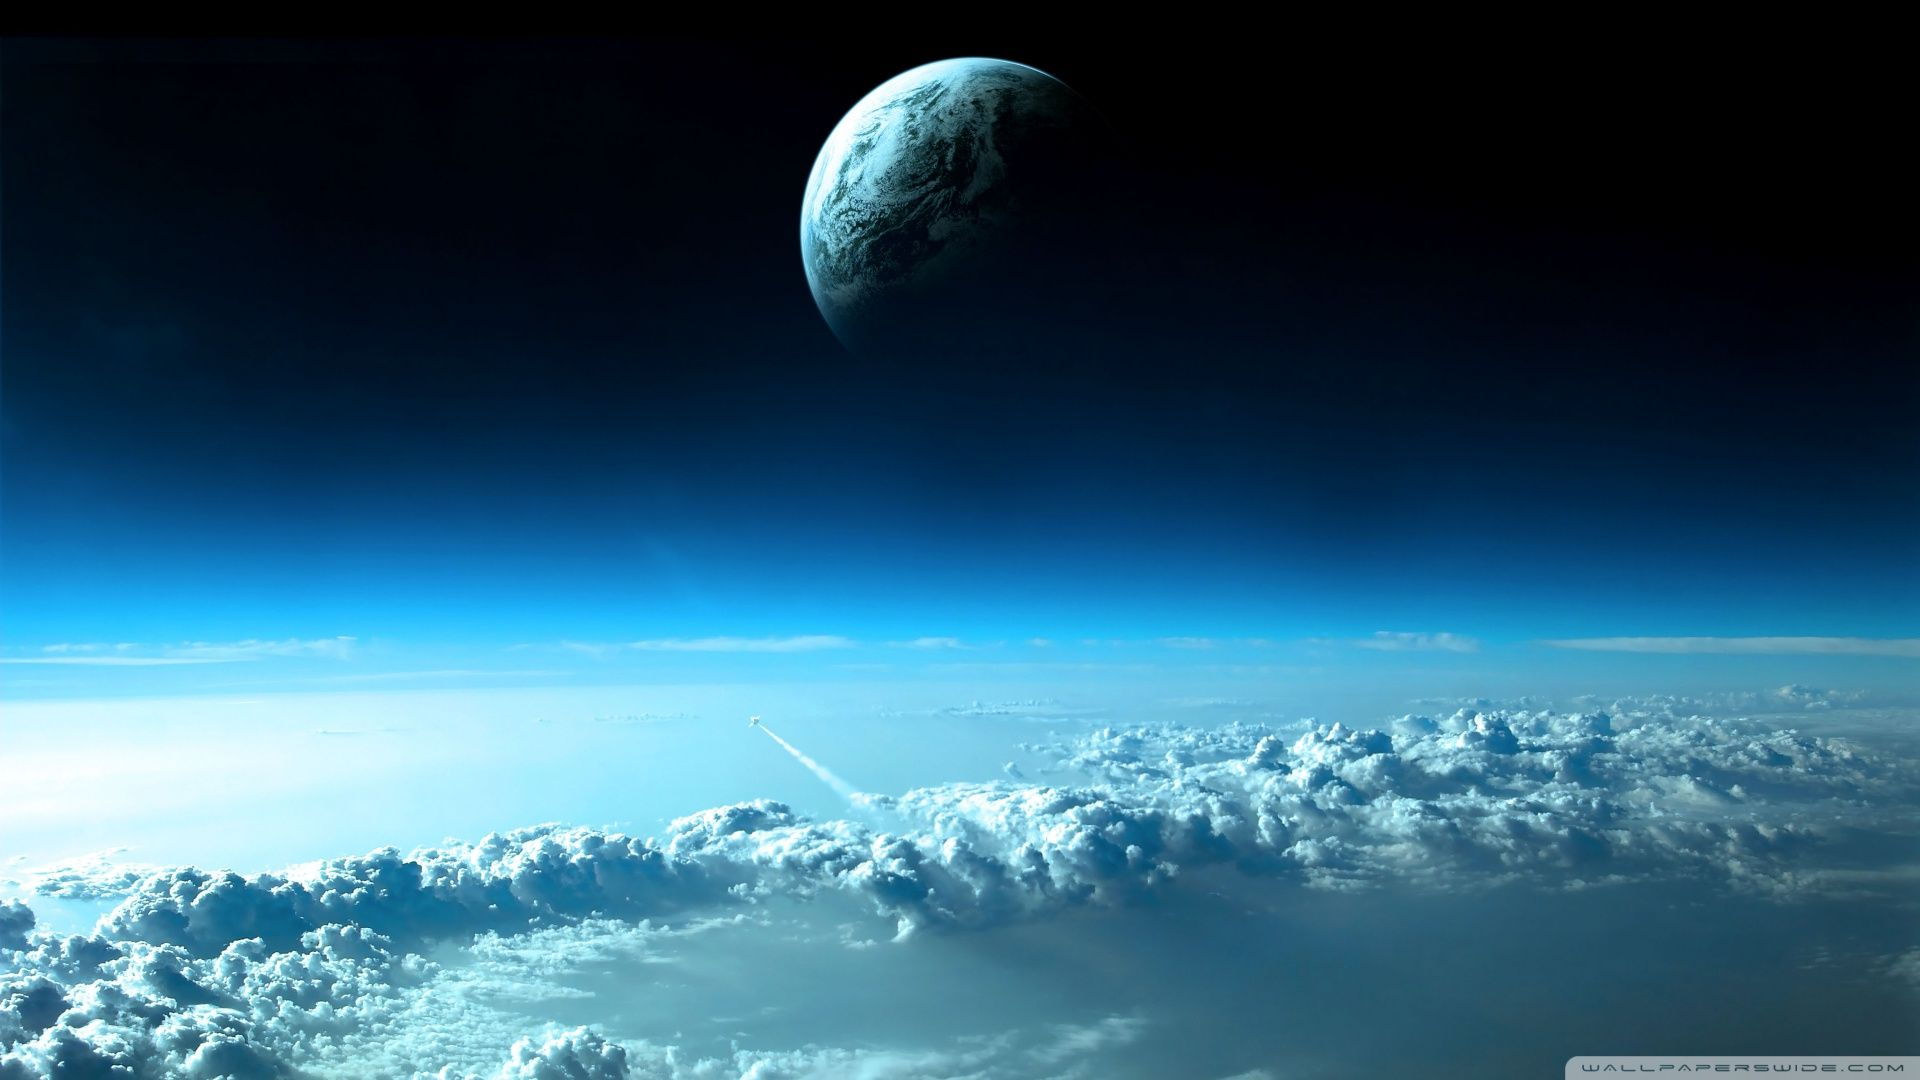 beautiful space view hd desktop wallpaper high definition mobile